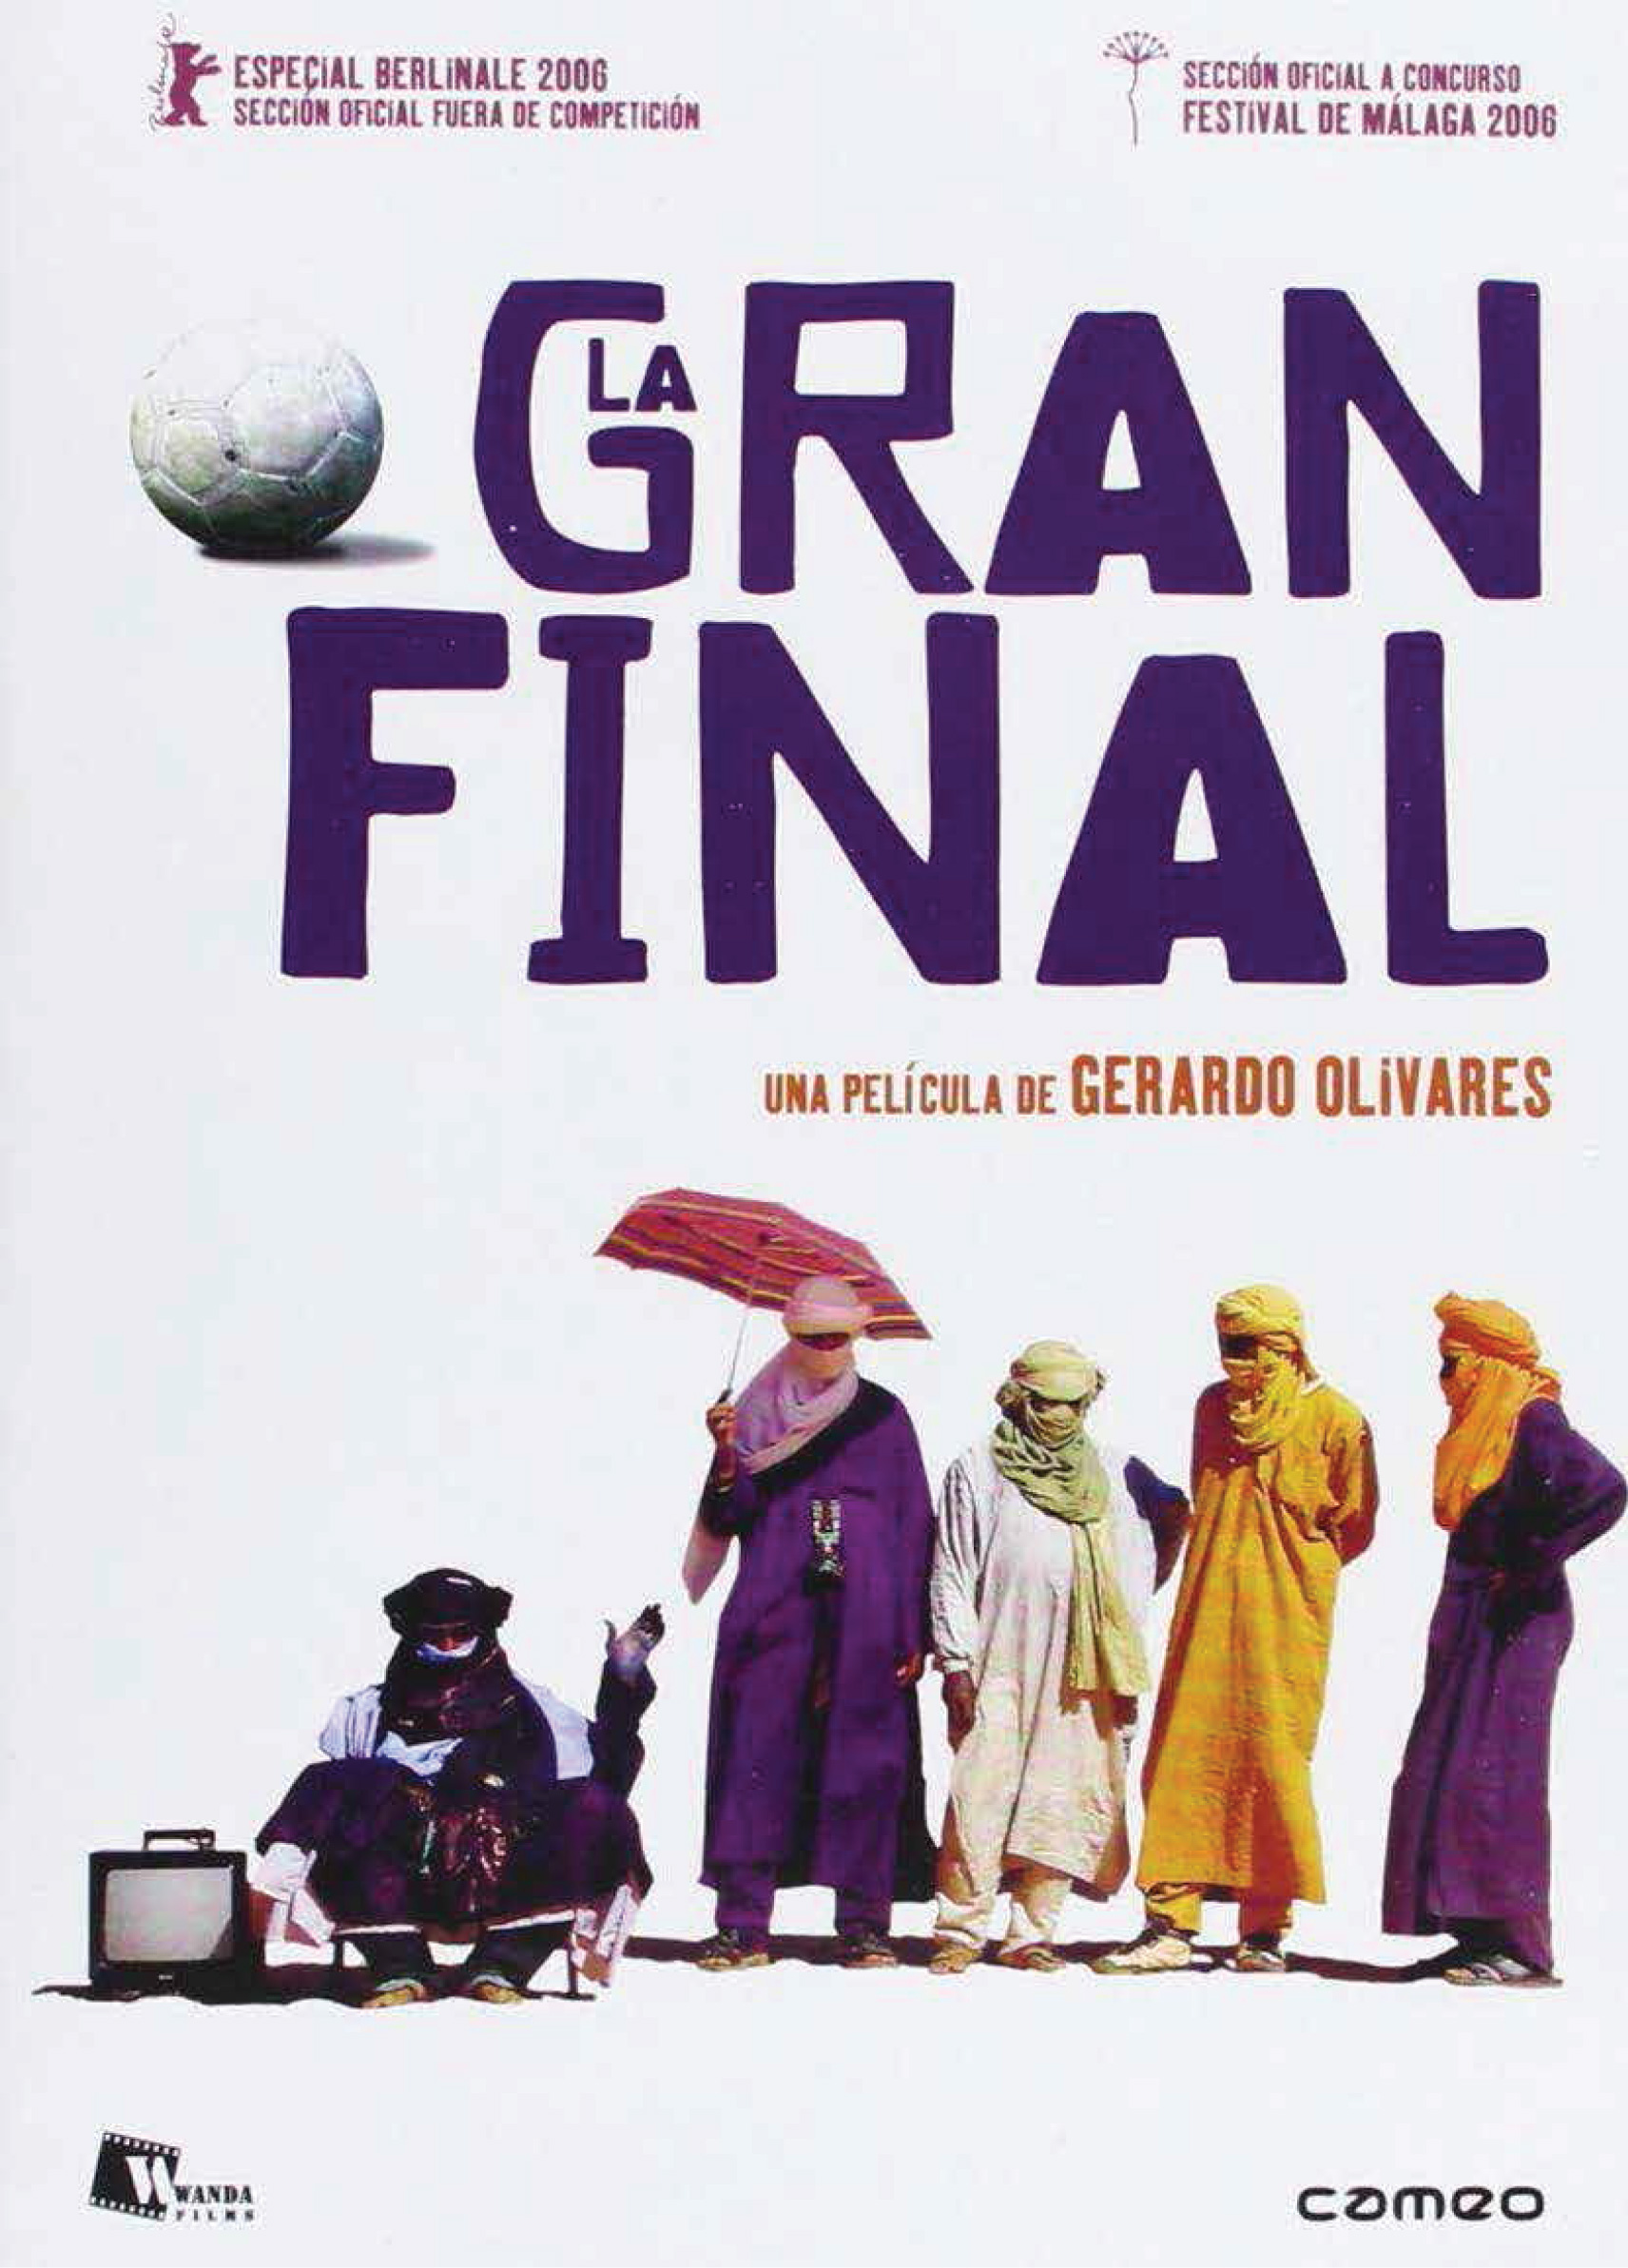 Büyük Final